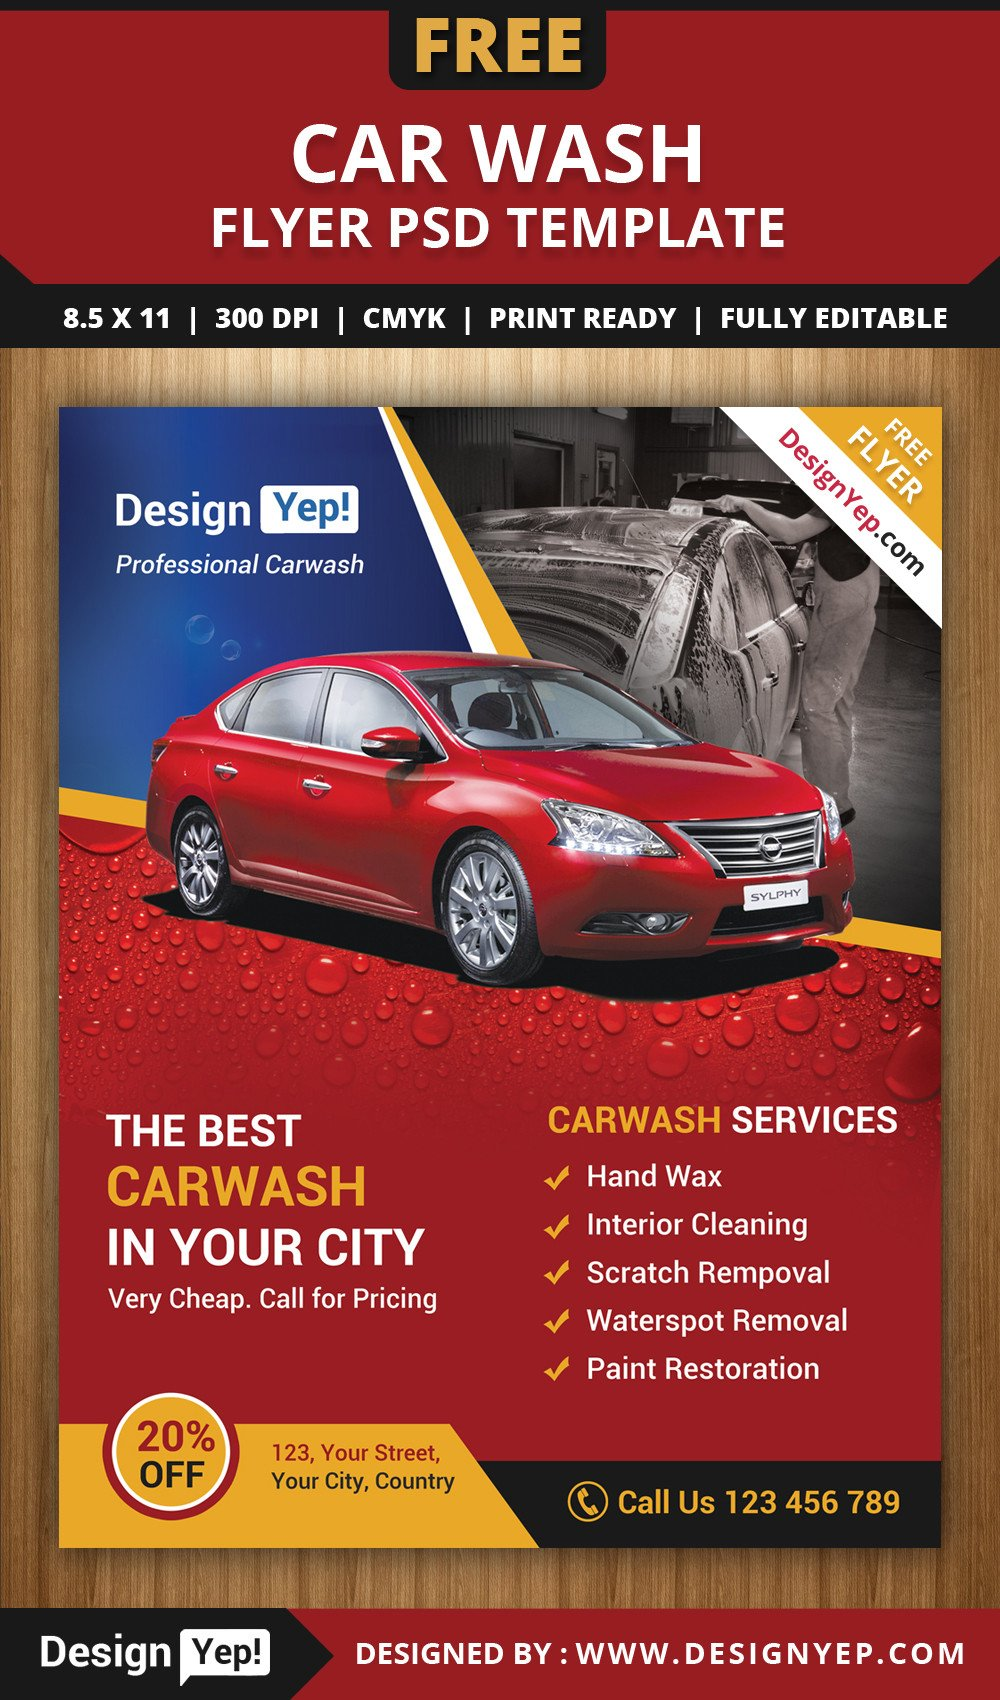 Car Wash Flyer Template Free Car Wash Flyer Psd Template Designyep